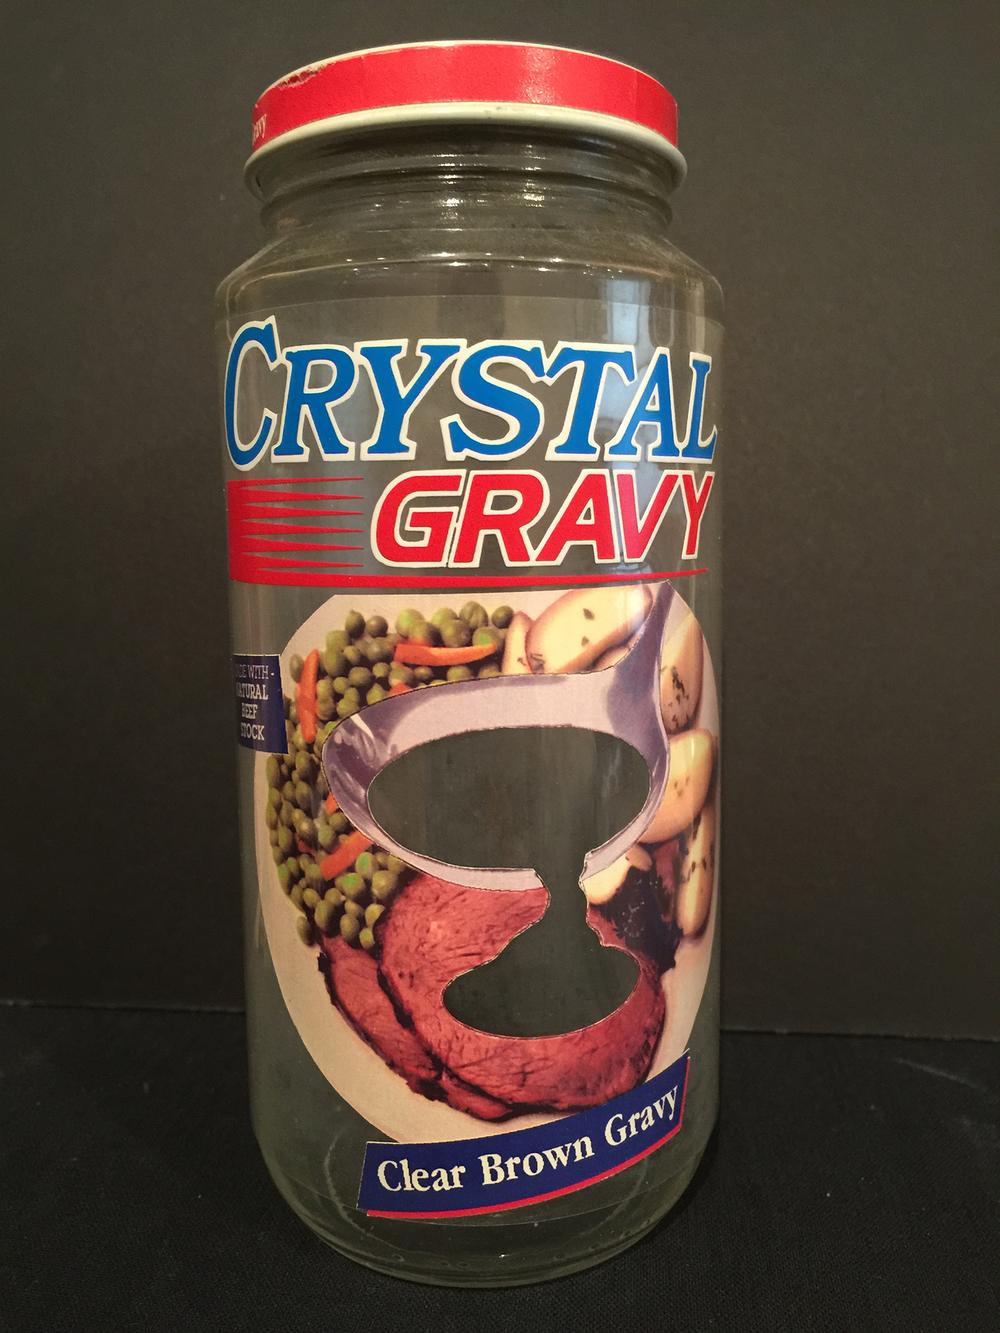 crystalgravy.jpg